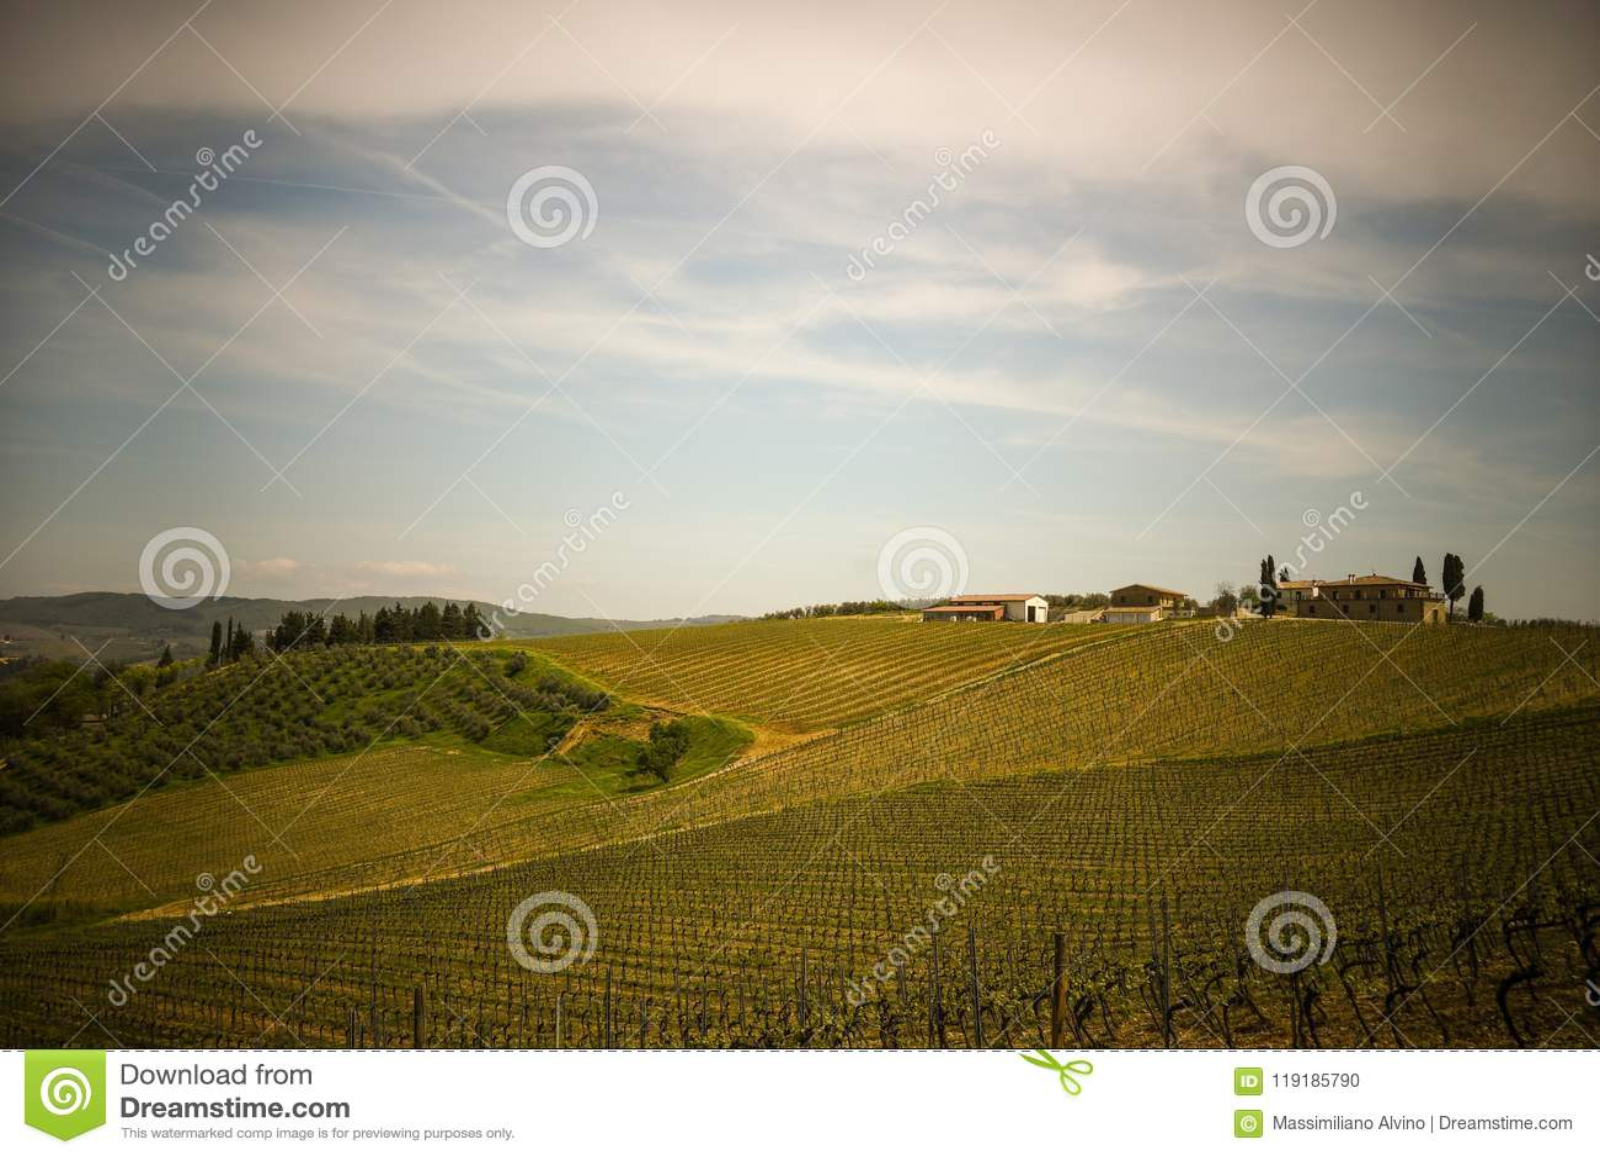 Paysage typique de la campagne toscane